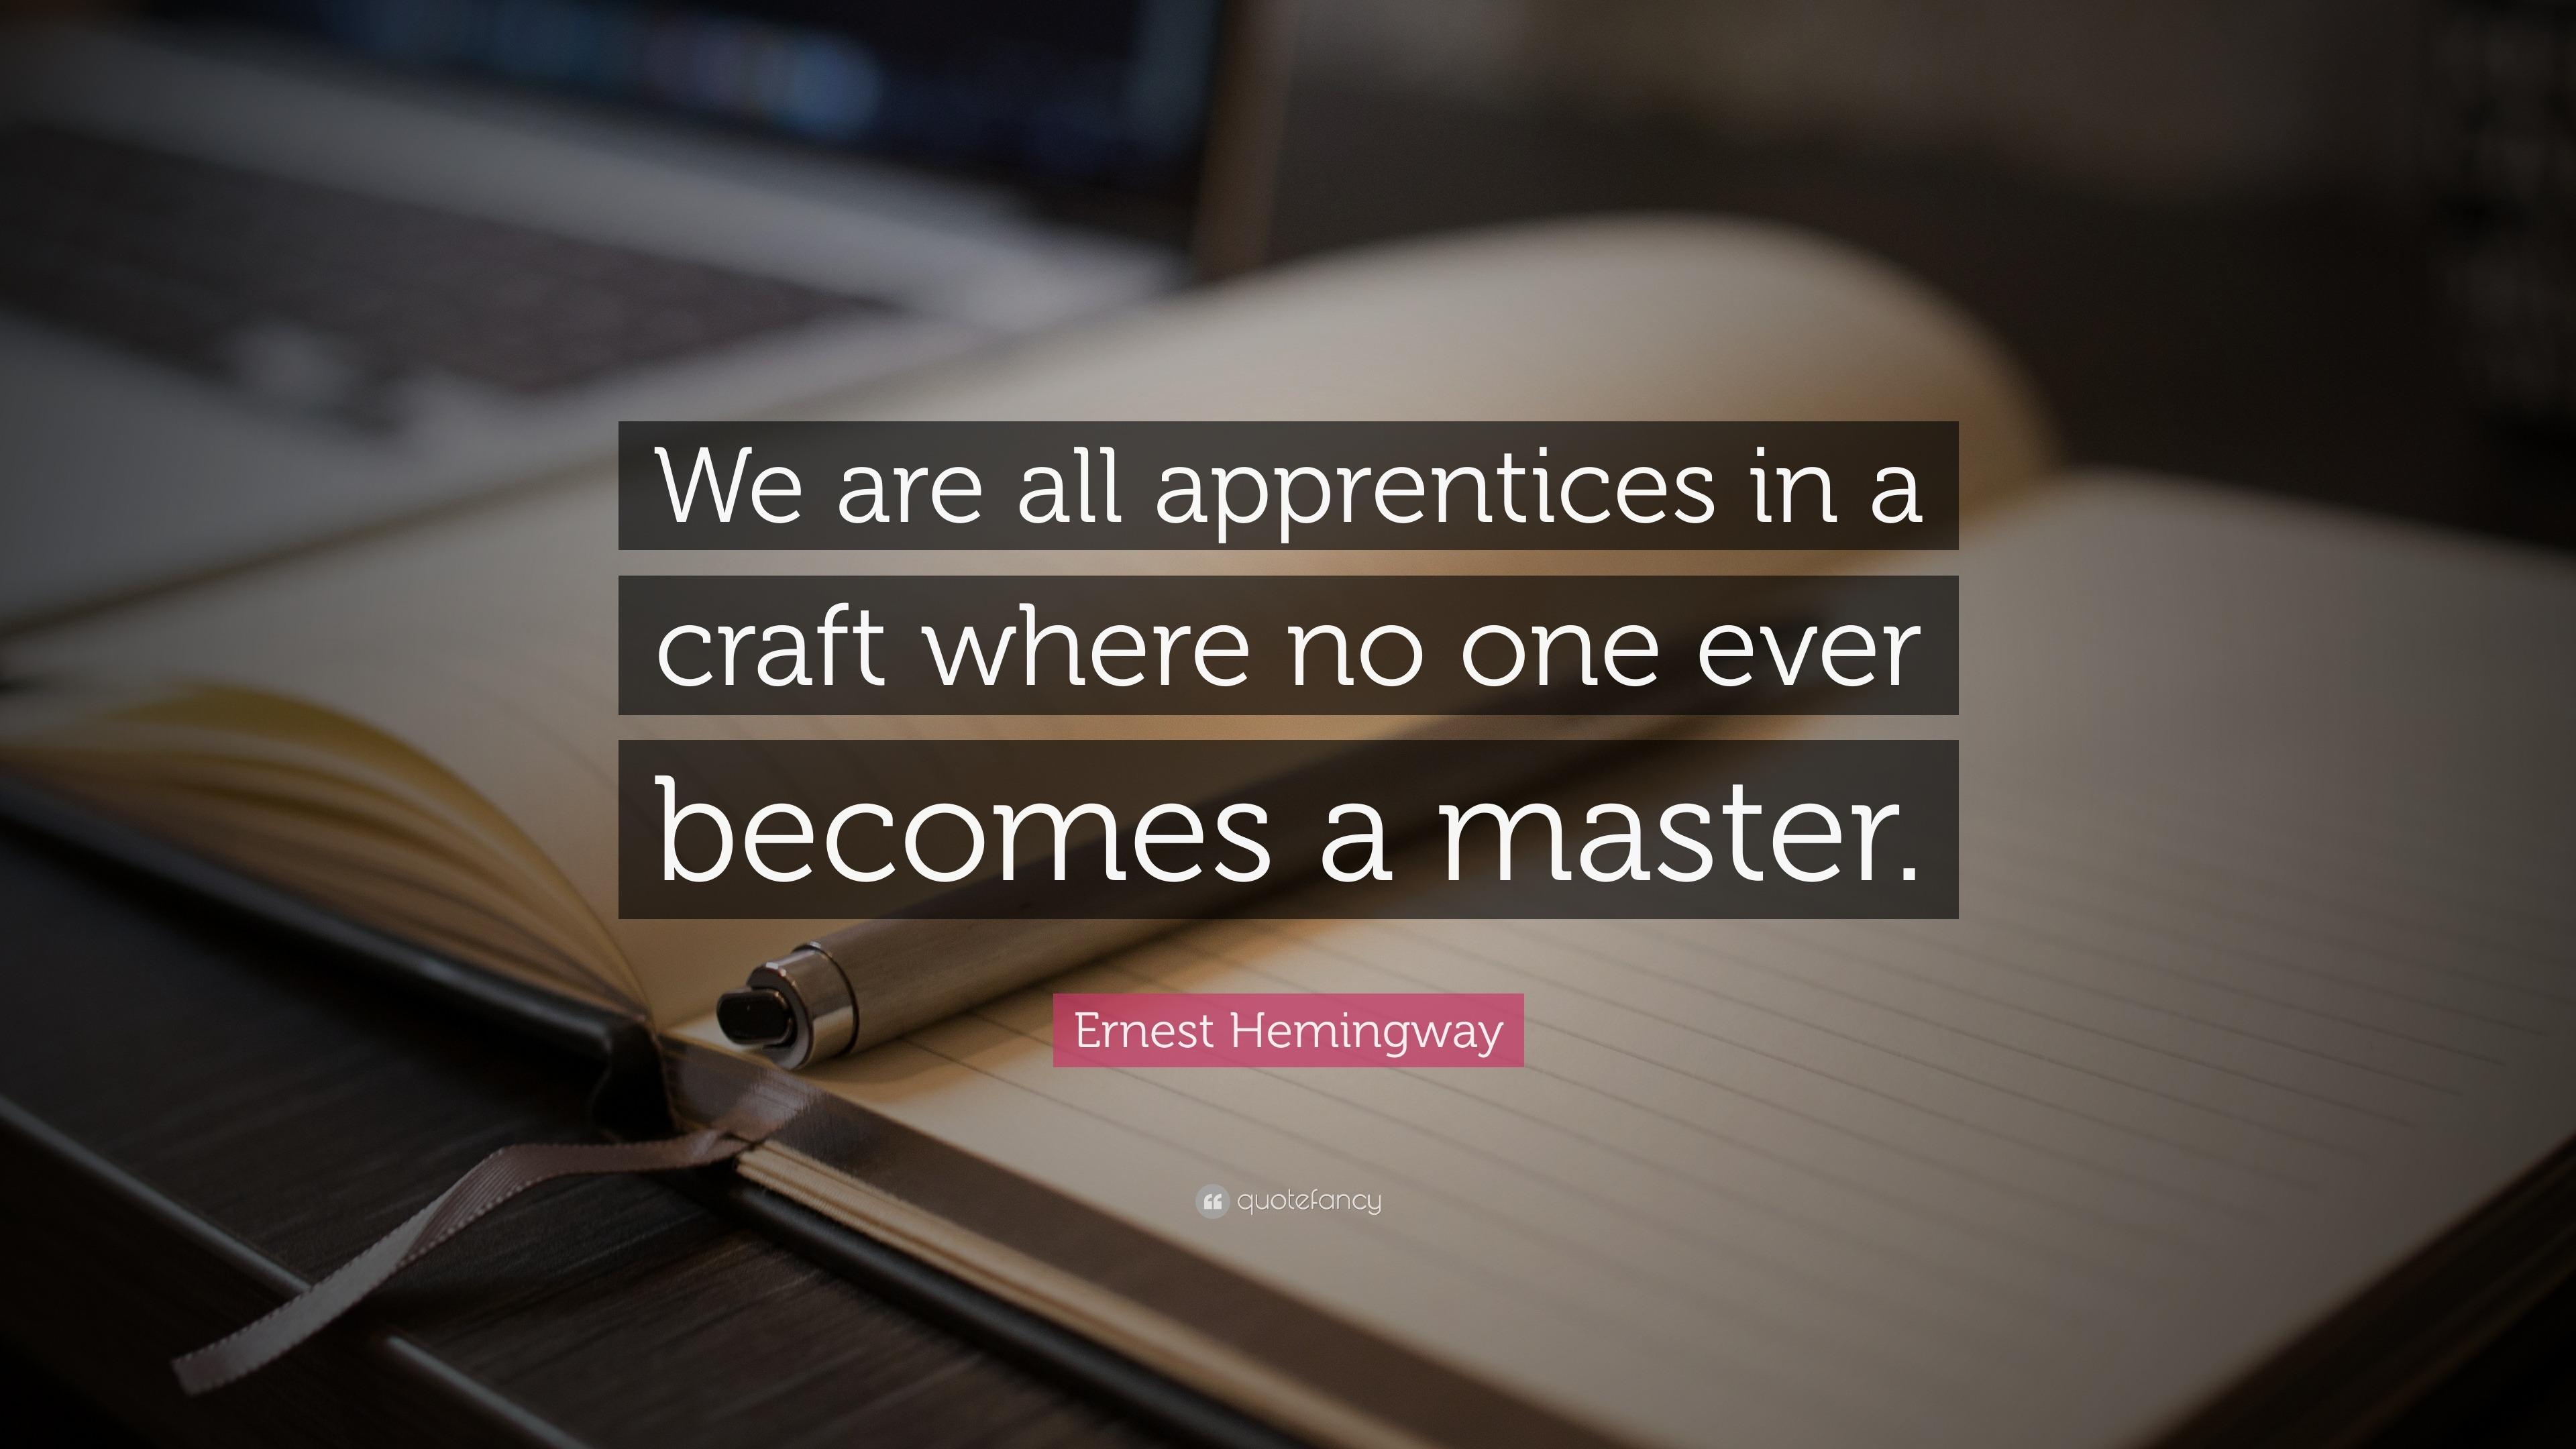 Ernest Hemingway Quotes 100 Wallpapers Quotefancy